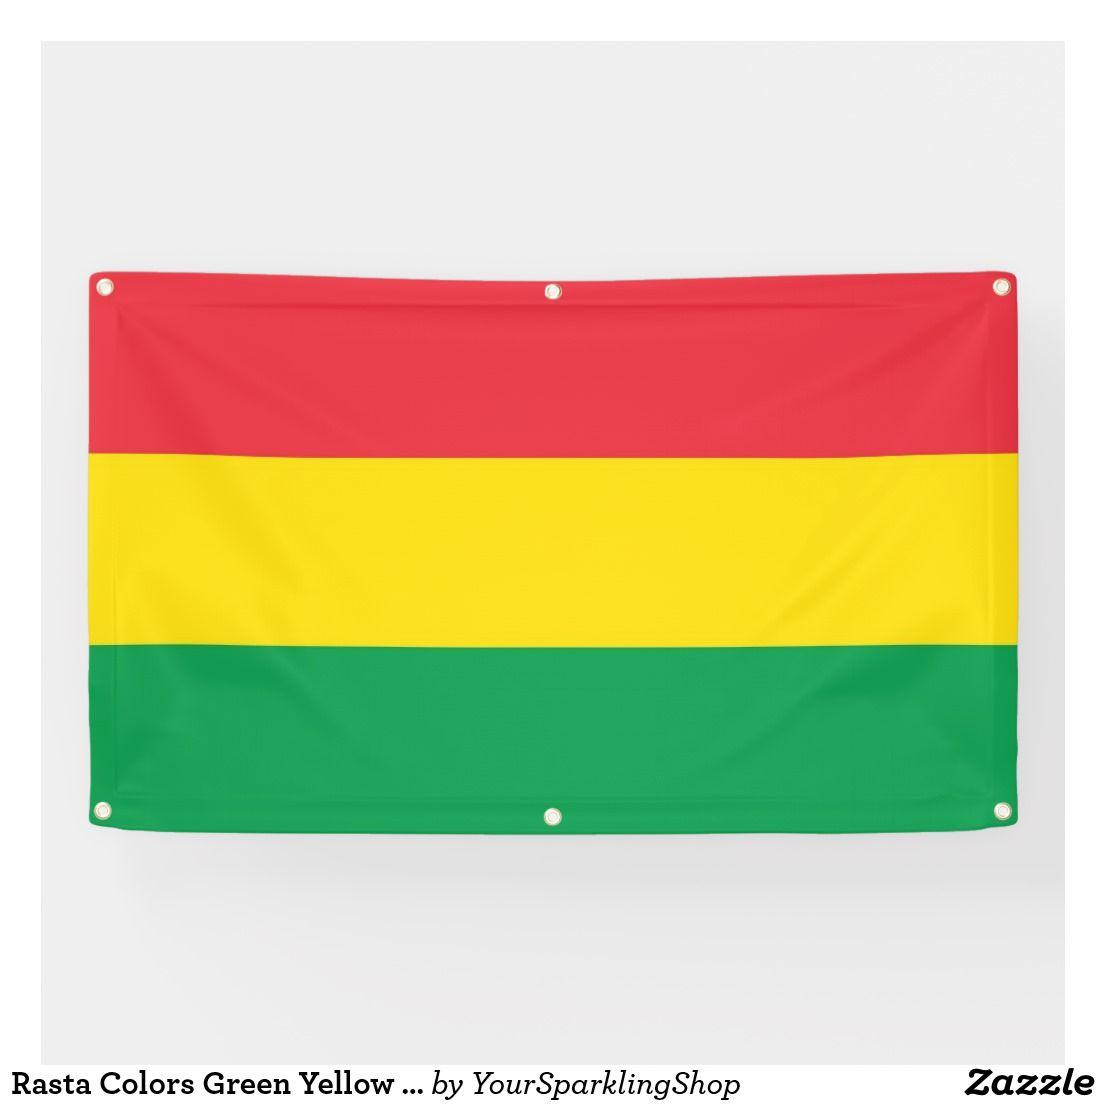 Rasta Colors Green Yellow Red Stripes Flag Pattern Banner Zazzle Com Rasta Colors Red Stripes Red Green Yellow